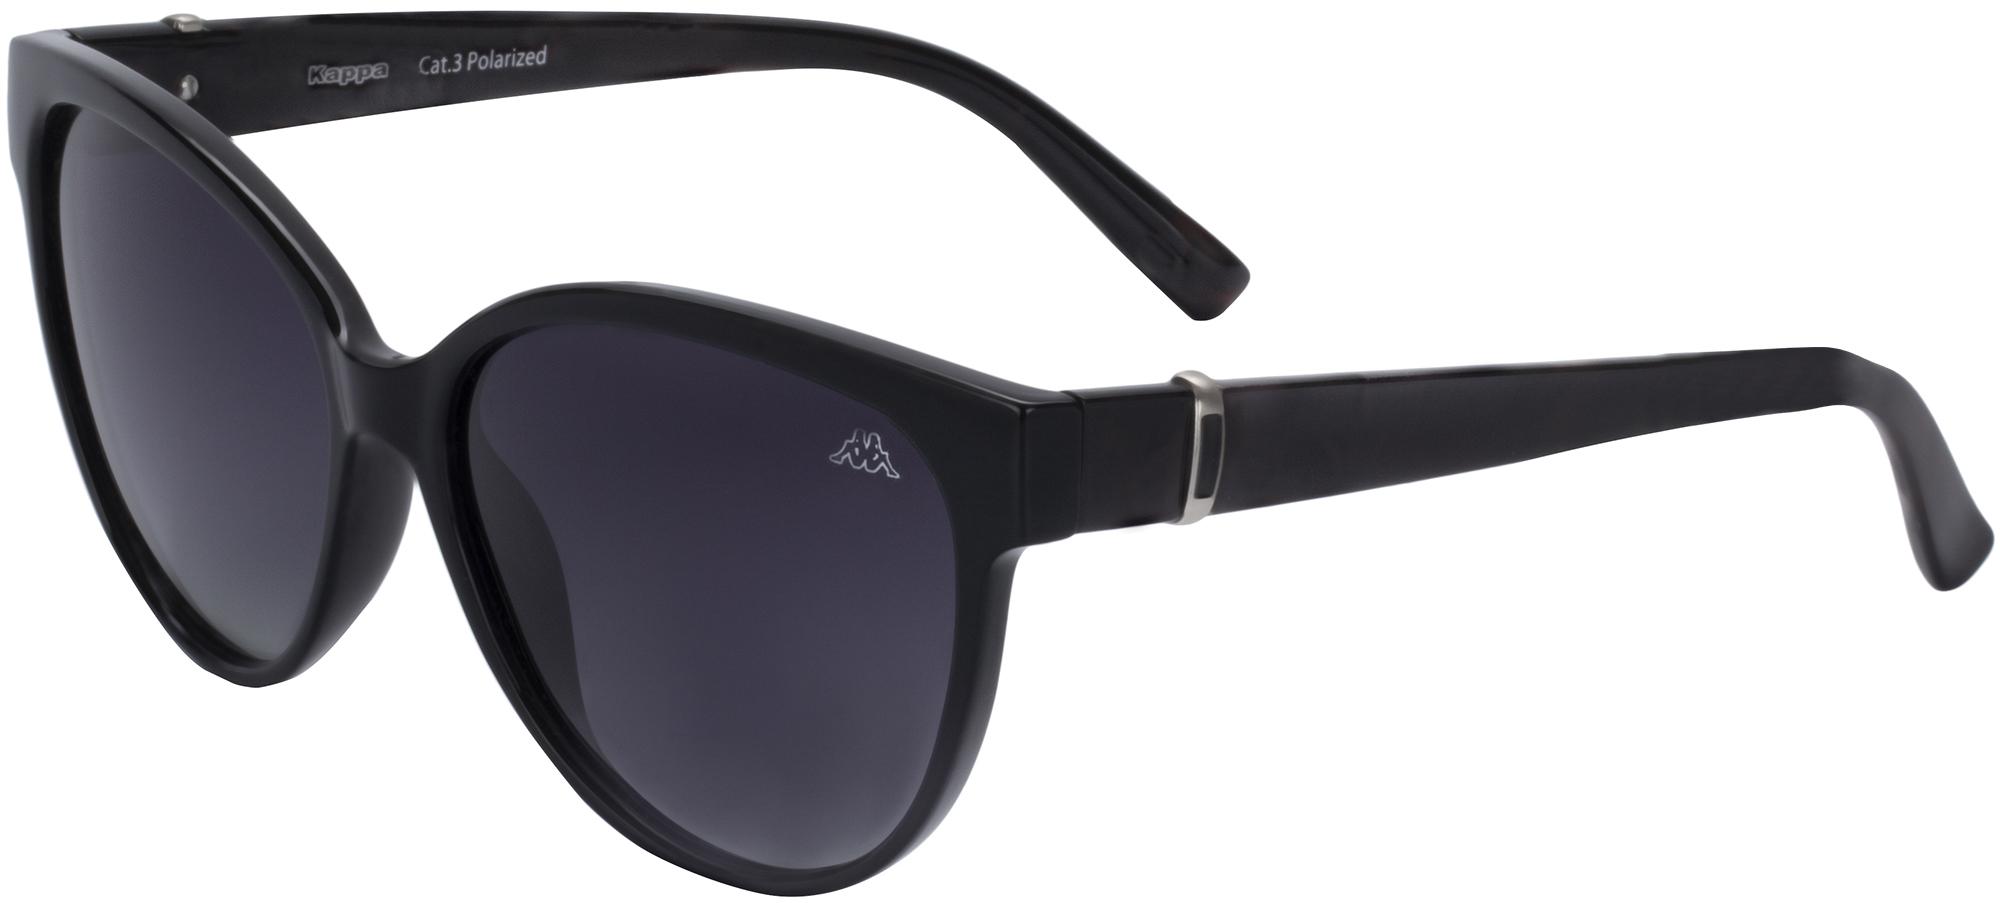 Kappa Солнцезащитные очки